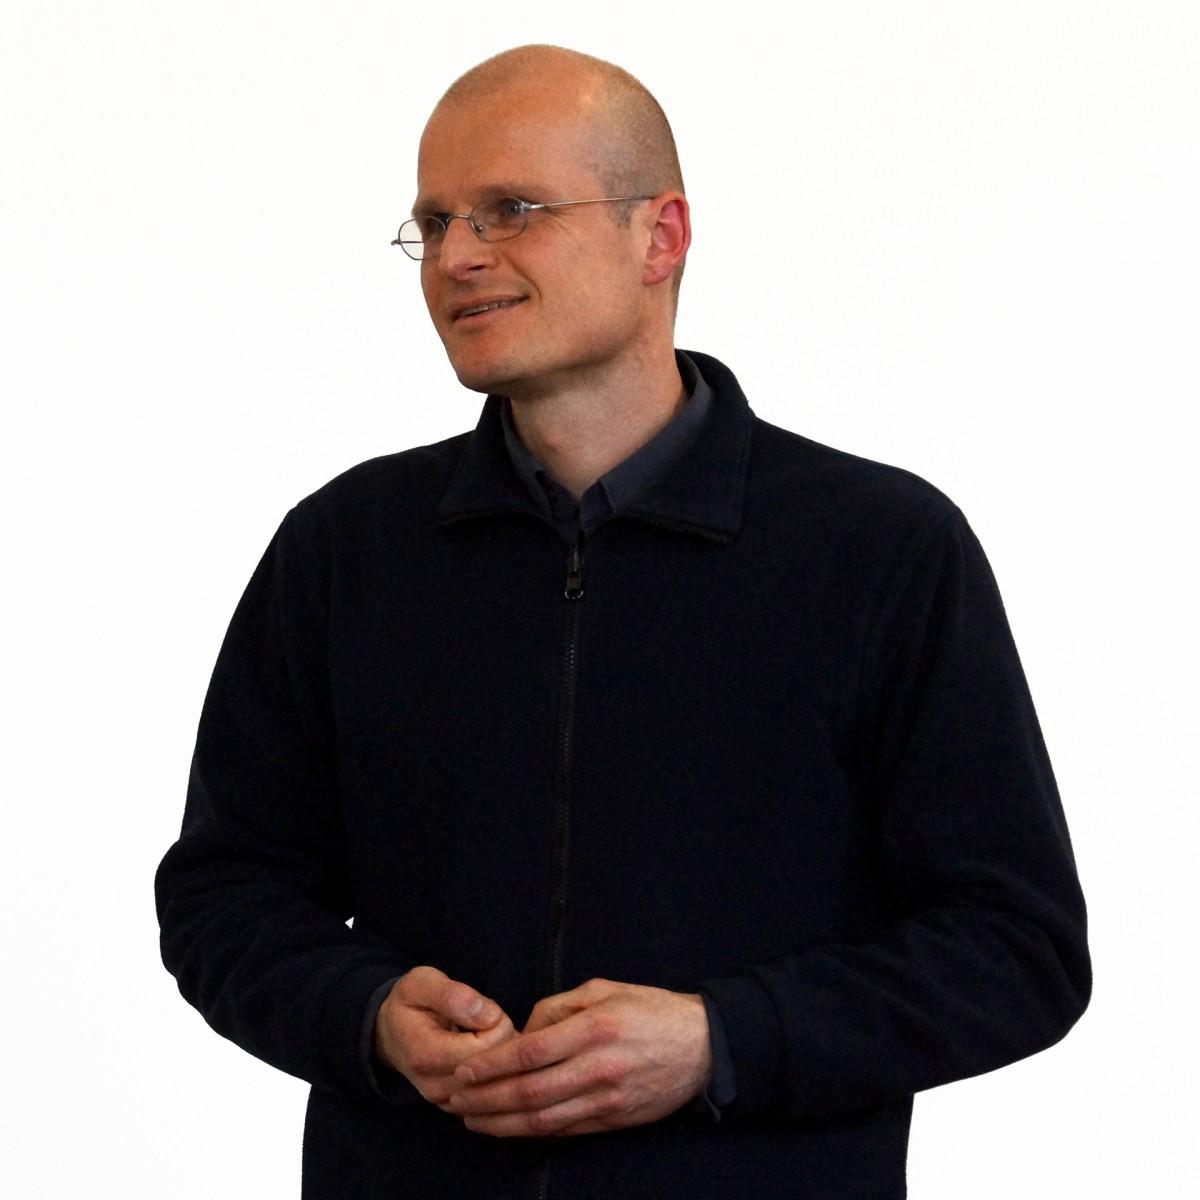 Jürgen Krause (Bild 11): Künstler im Gespräch – Kunsthaus Nürnberg (2015)